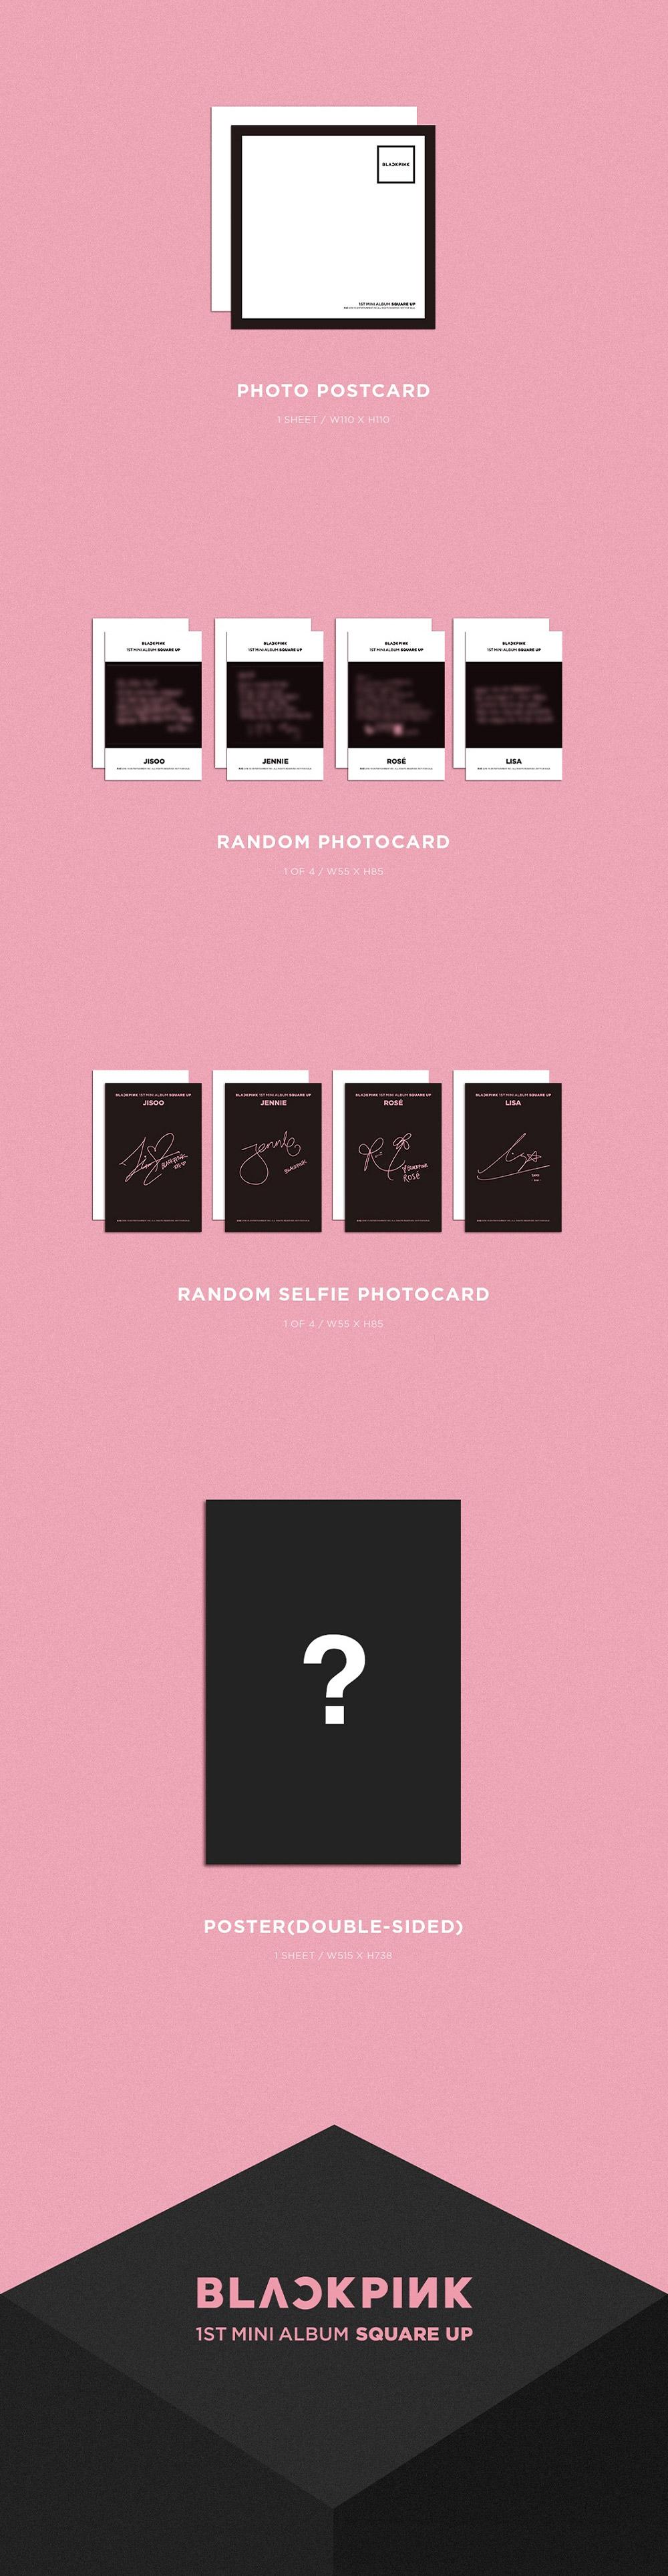 Blackpink 1st Mini Album Square Up Pink Ver Cd Poster